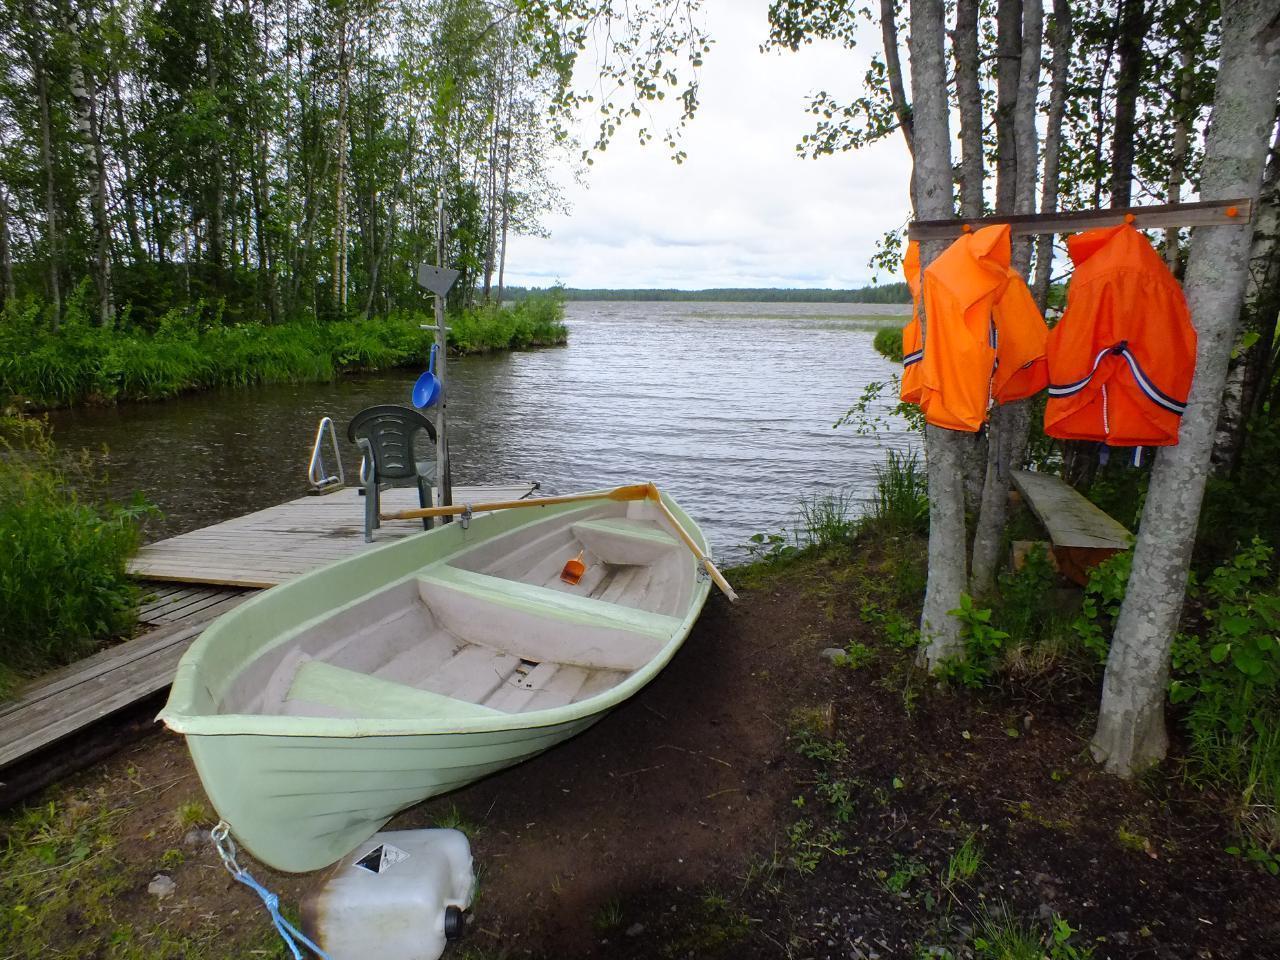 Ferienhaus - Mökki mit Sauna direkt am See  in Mouhijärvi-Sastamala (1707905), Mouhijärvi, , Westfinnland, Finnland, Bild 11